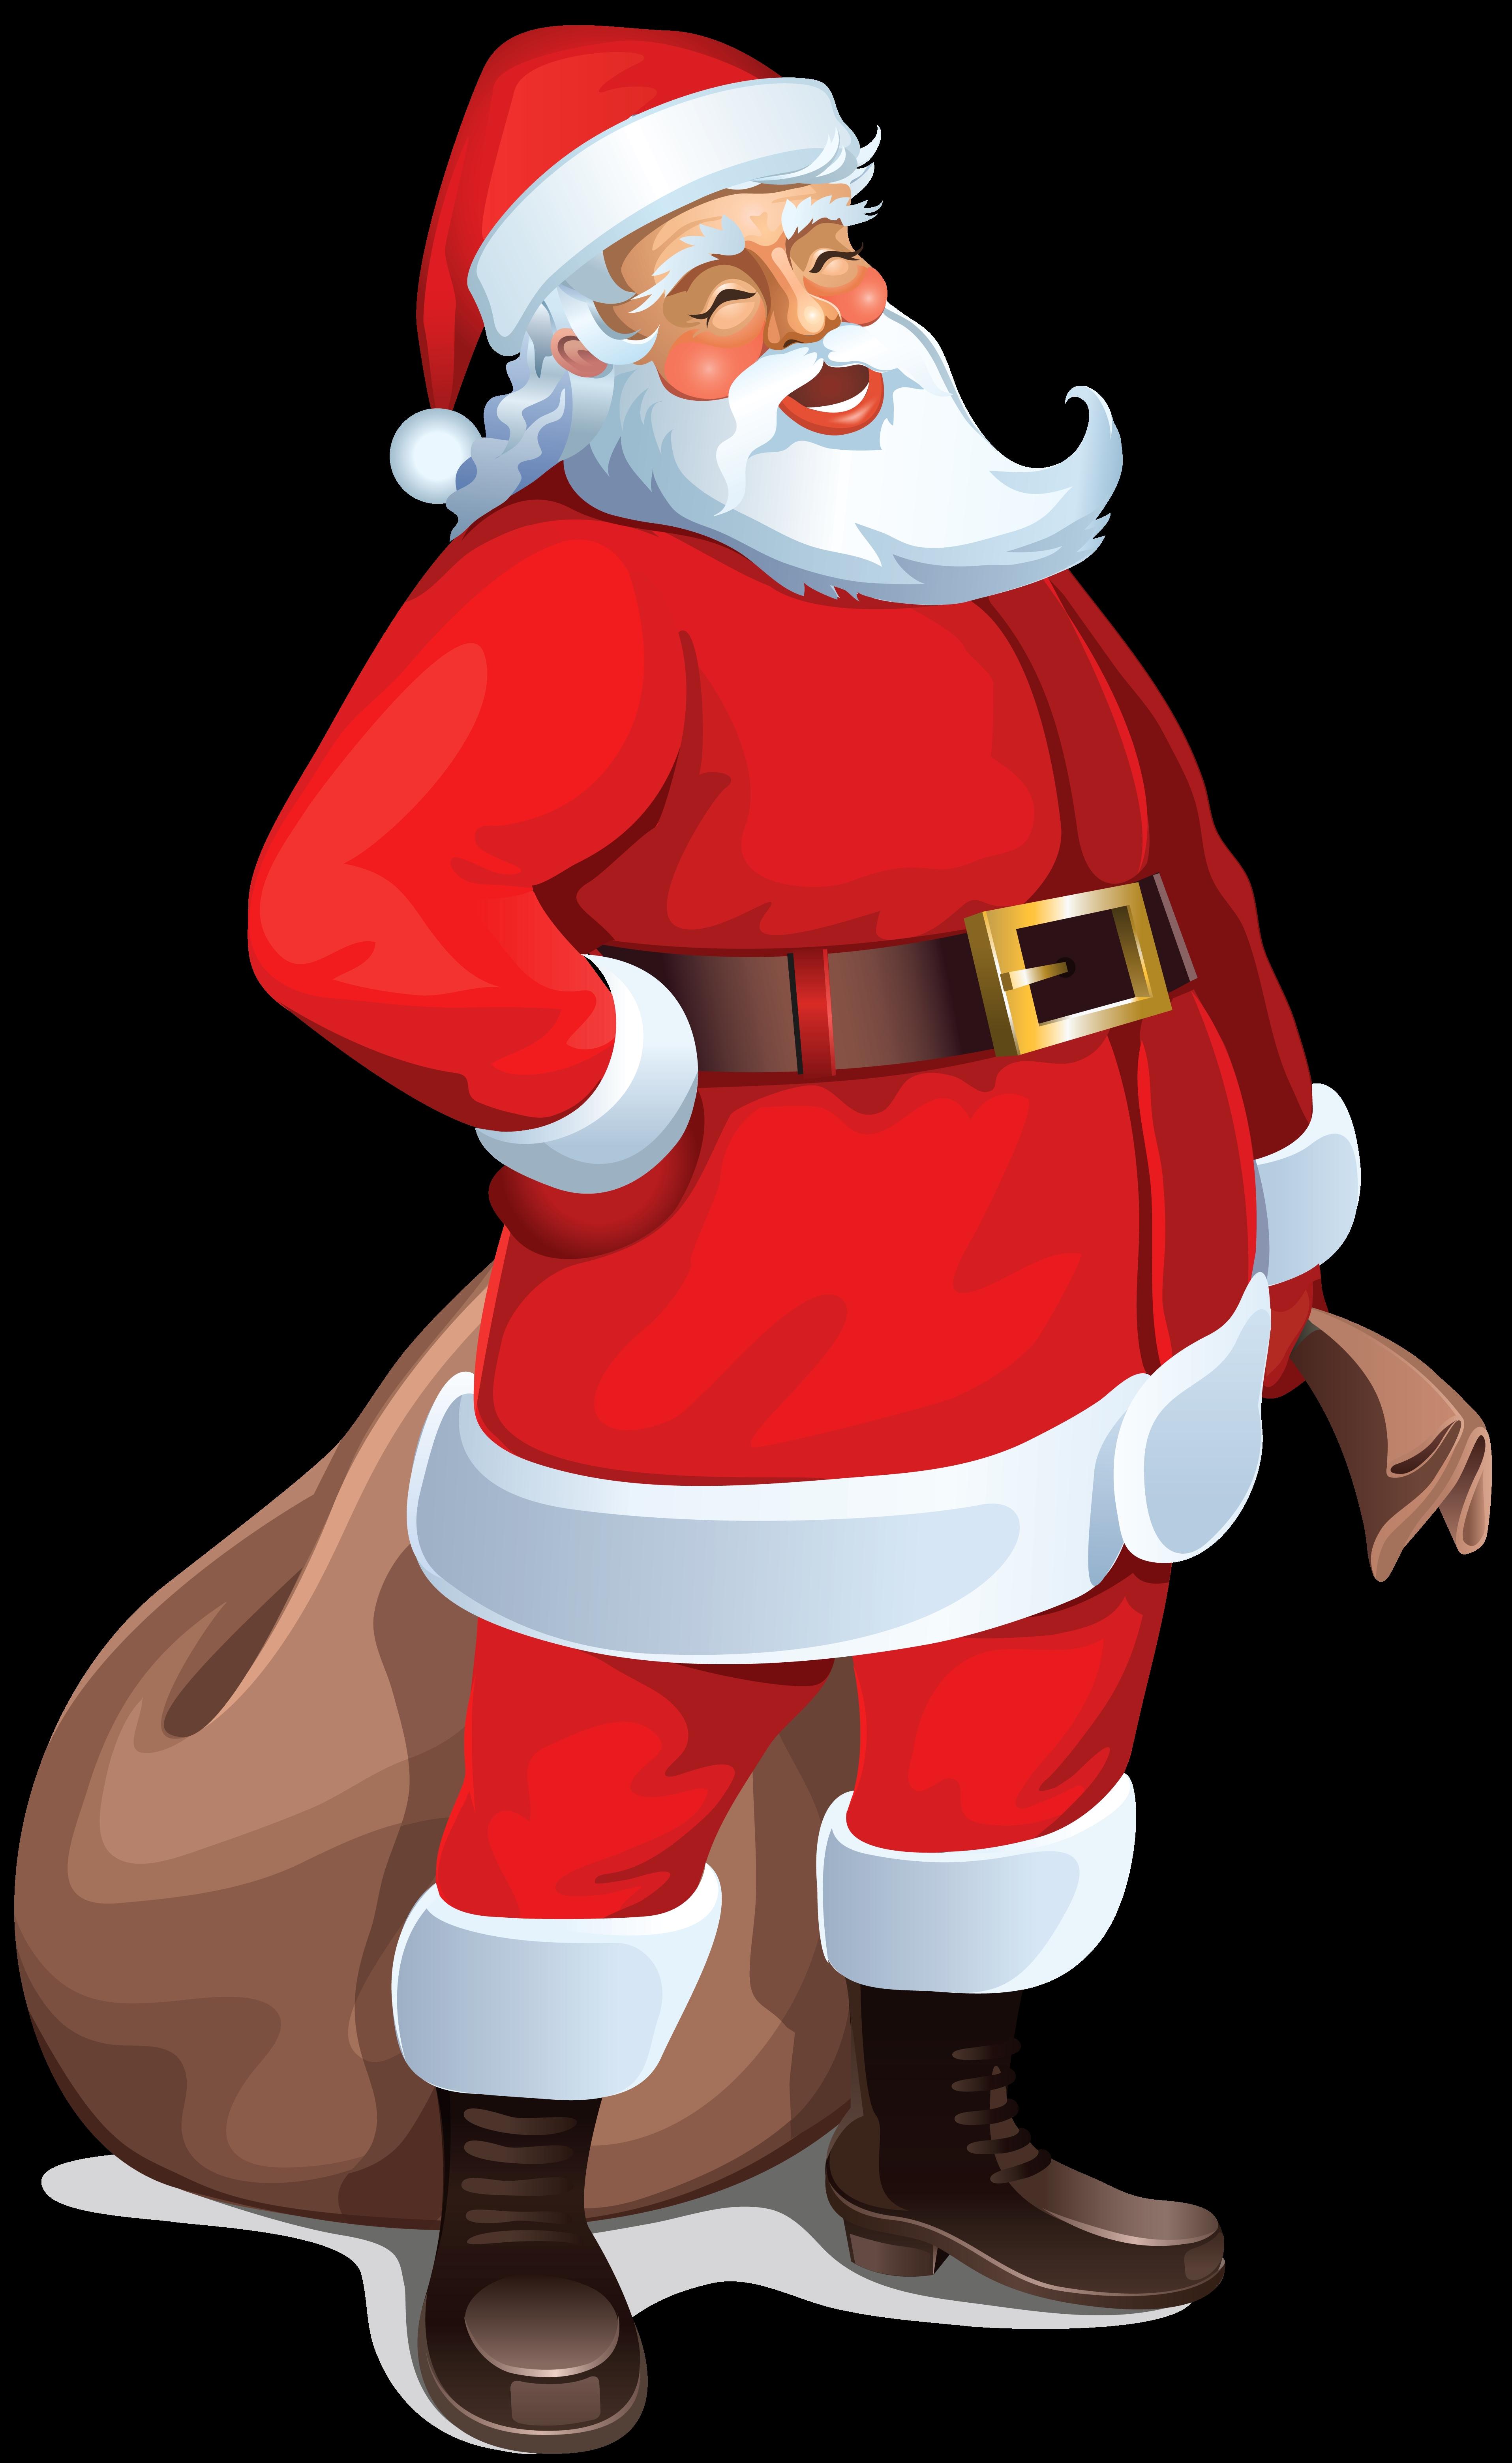 santa claus clipart hd image wallpaper